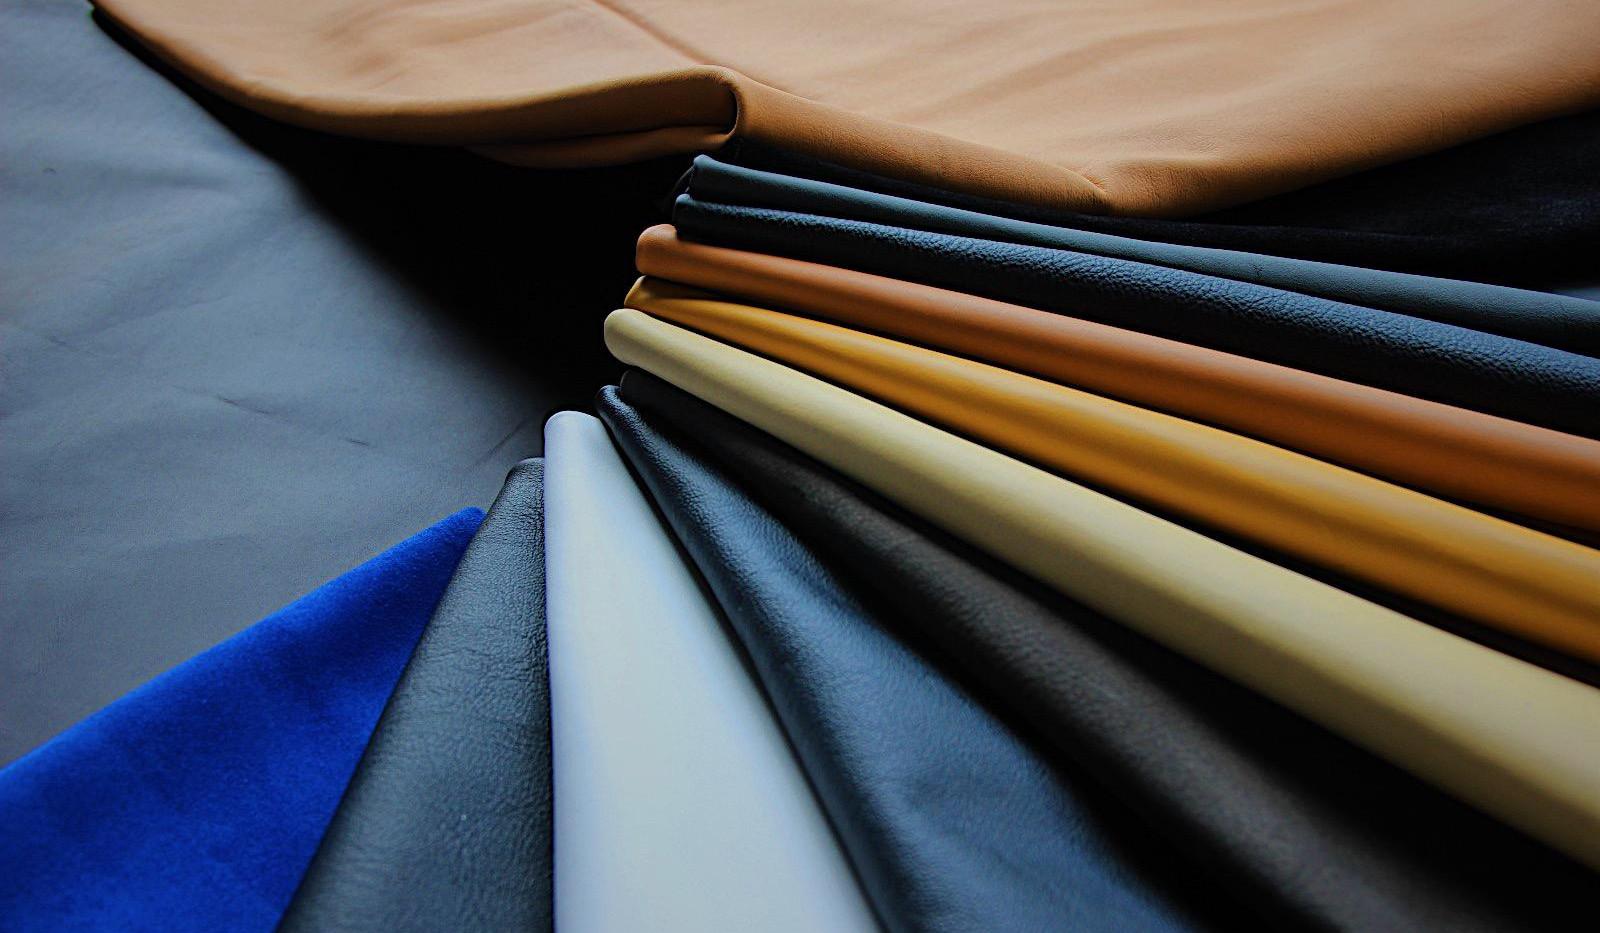 leather_stock_thesplits.jpeg